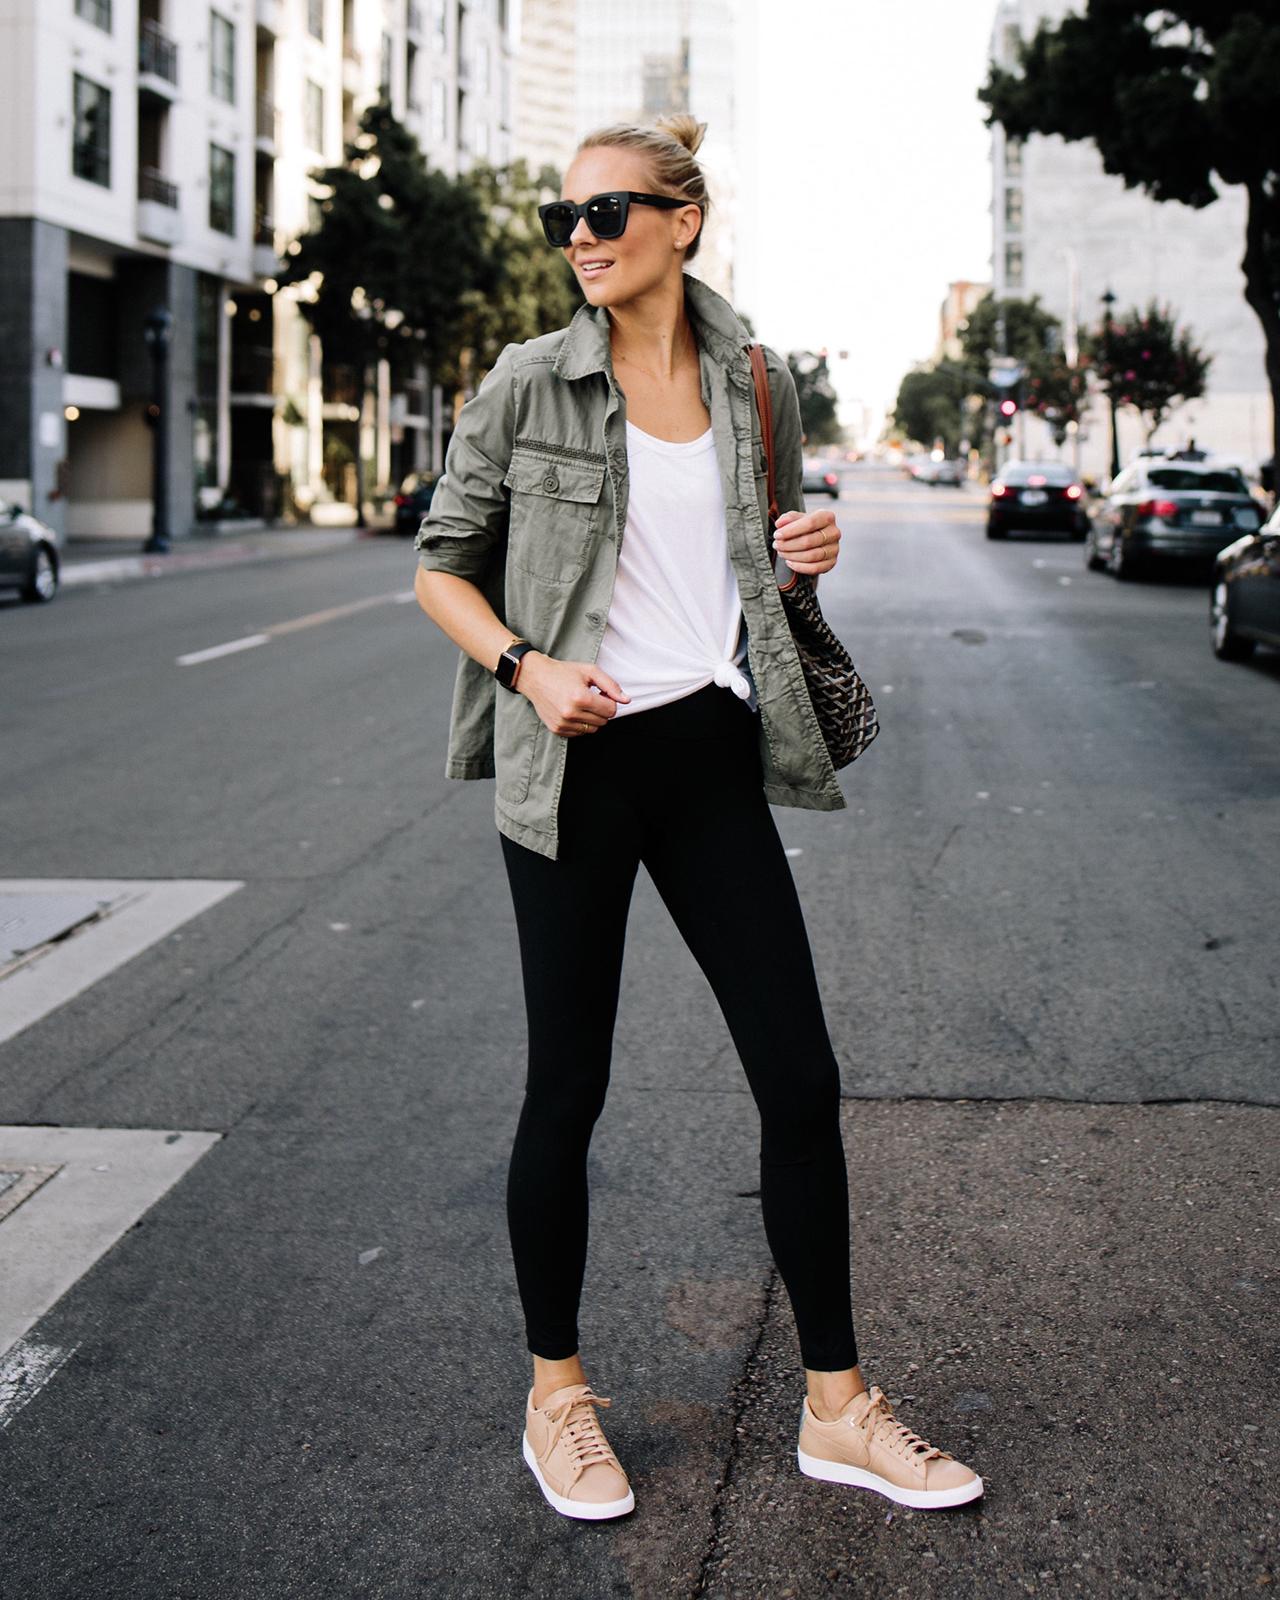 Fashion Jackson Green Utility Jacket White Tshirt Black Leggings Beige Nike Sneakers Goyard Tote